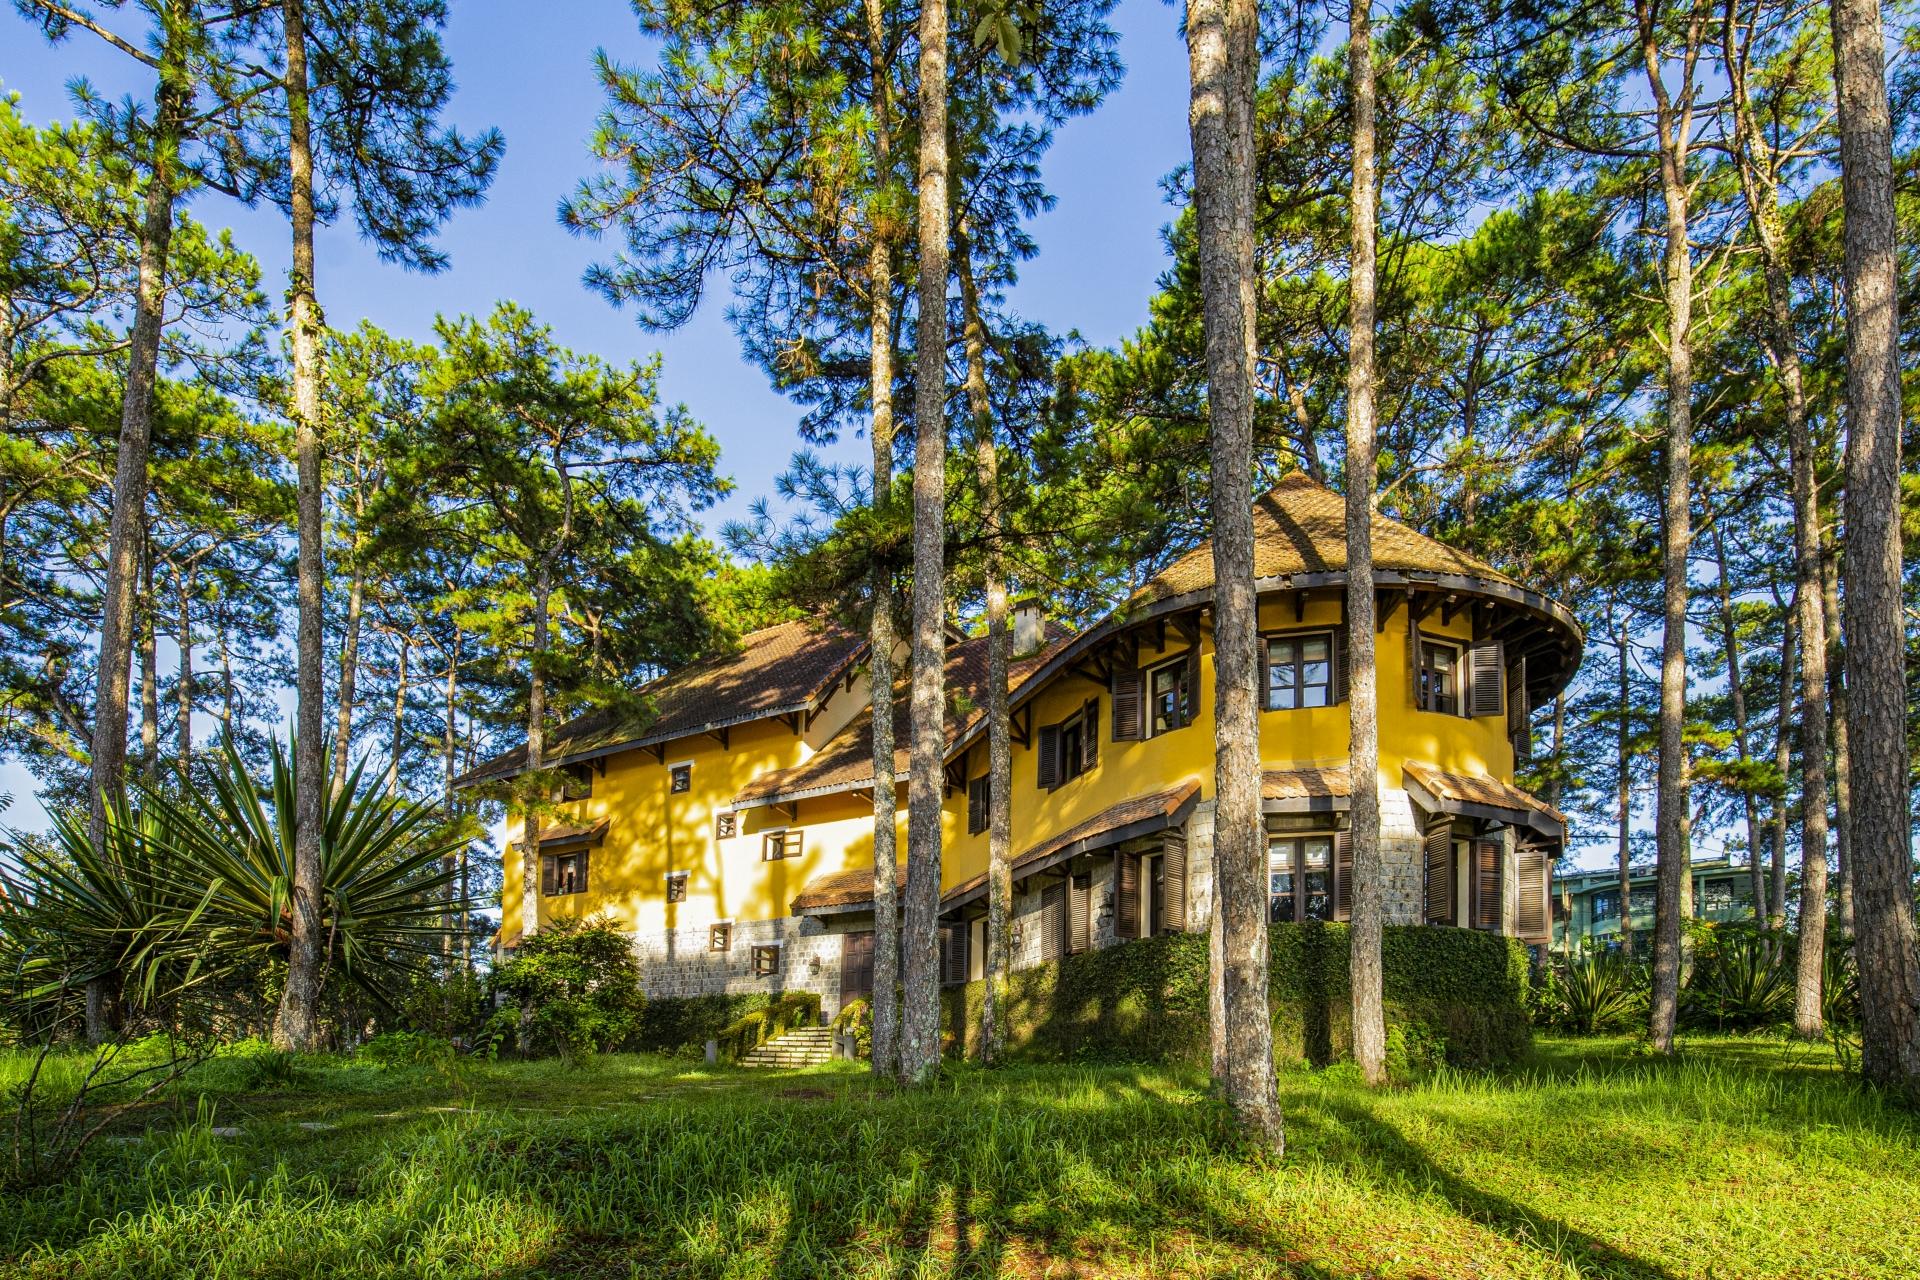 Emeralda Resort Ninh Binh and Ana Villas Dalat promotions for April